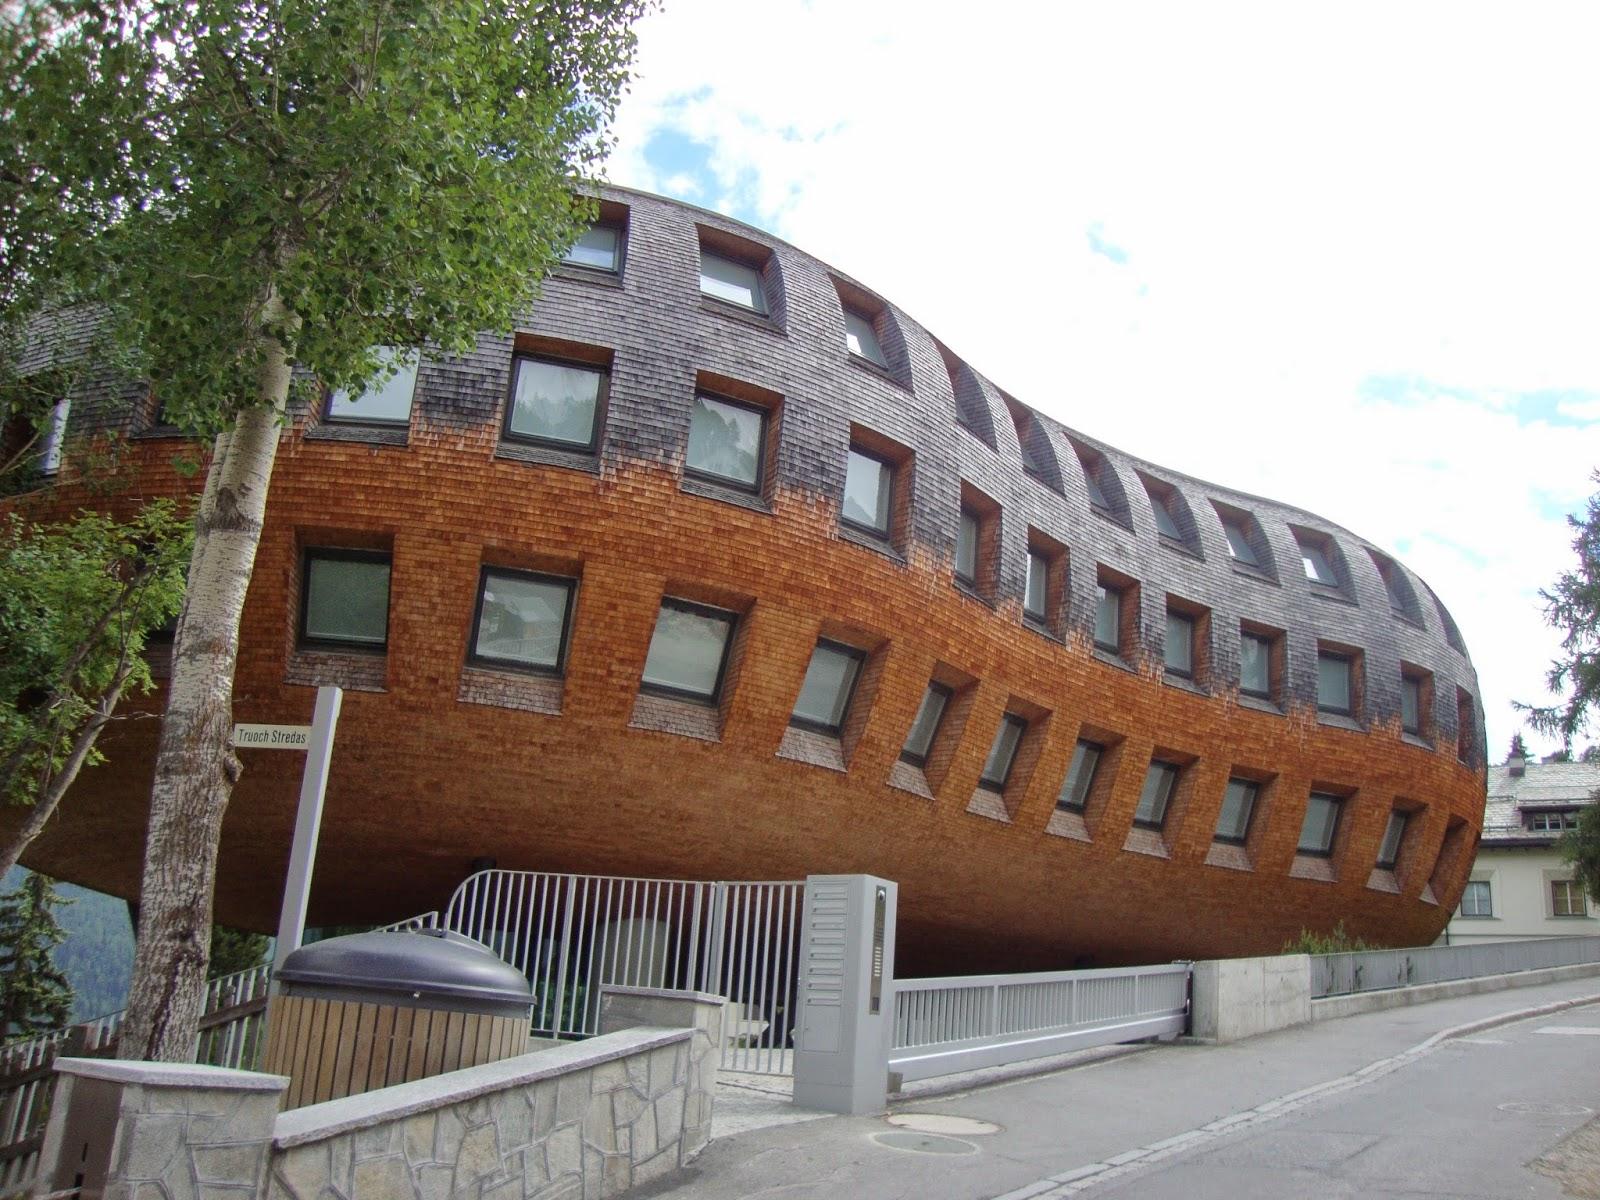 CHESA FUTURA (St. Moritz, Svizzera, 2004) Norman Foster & Partners